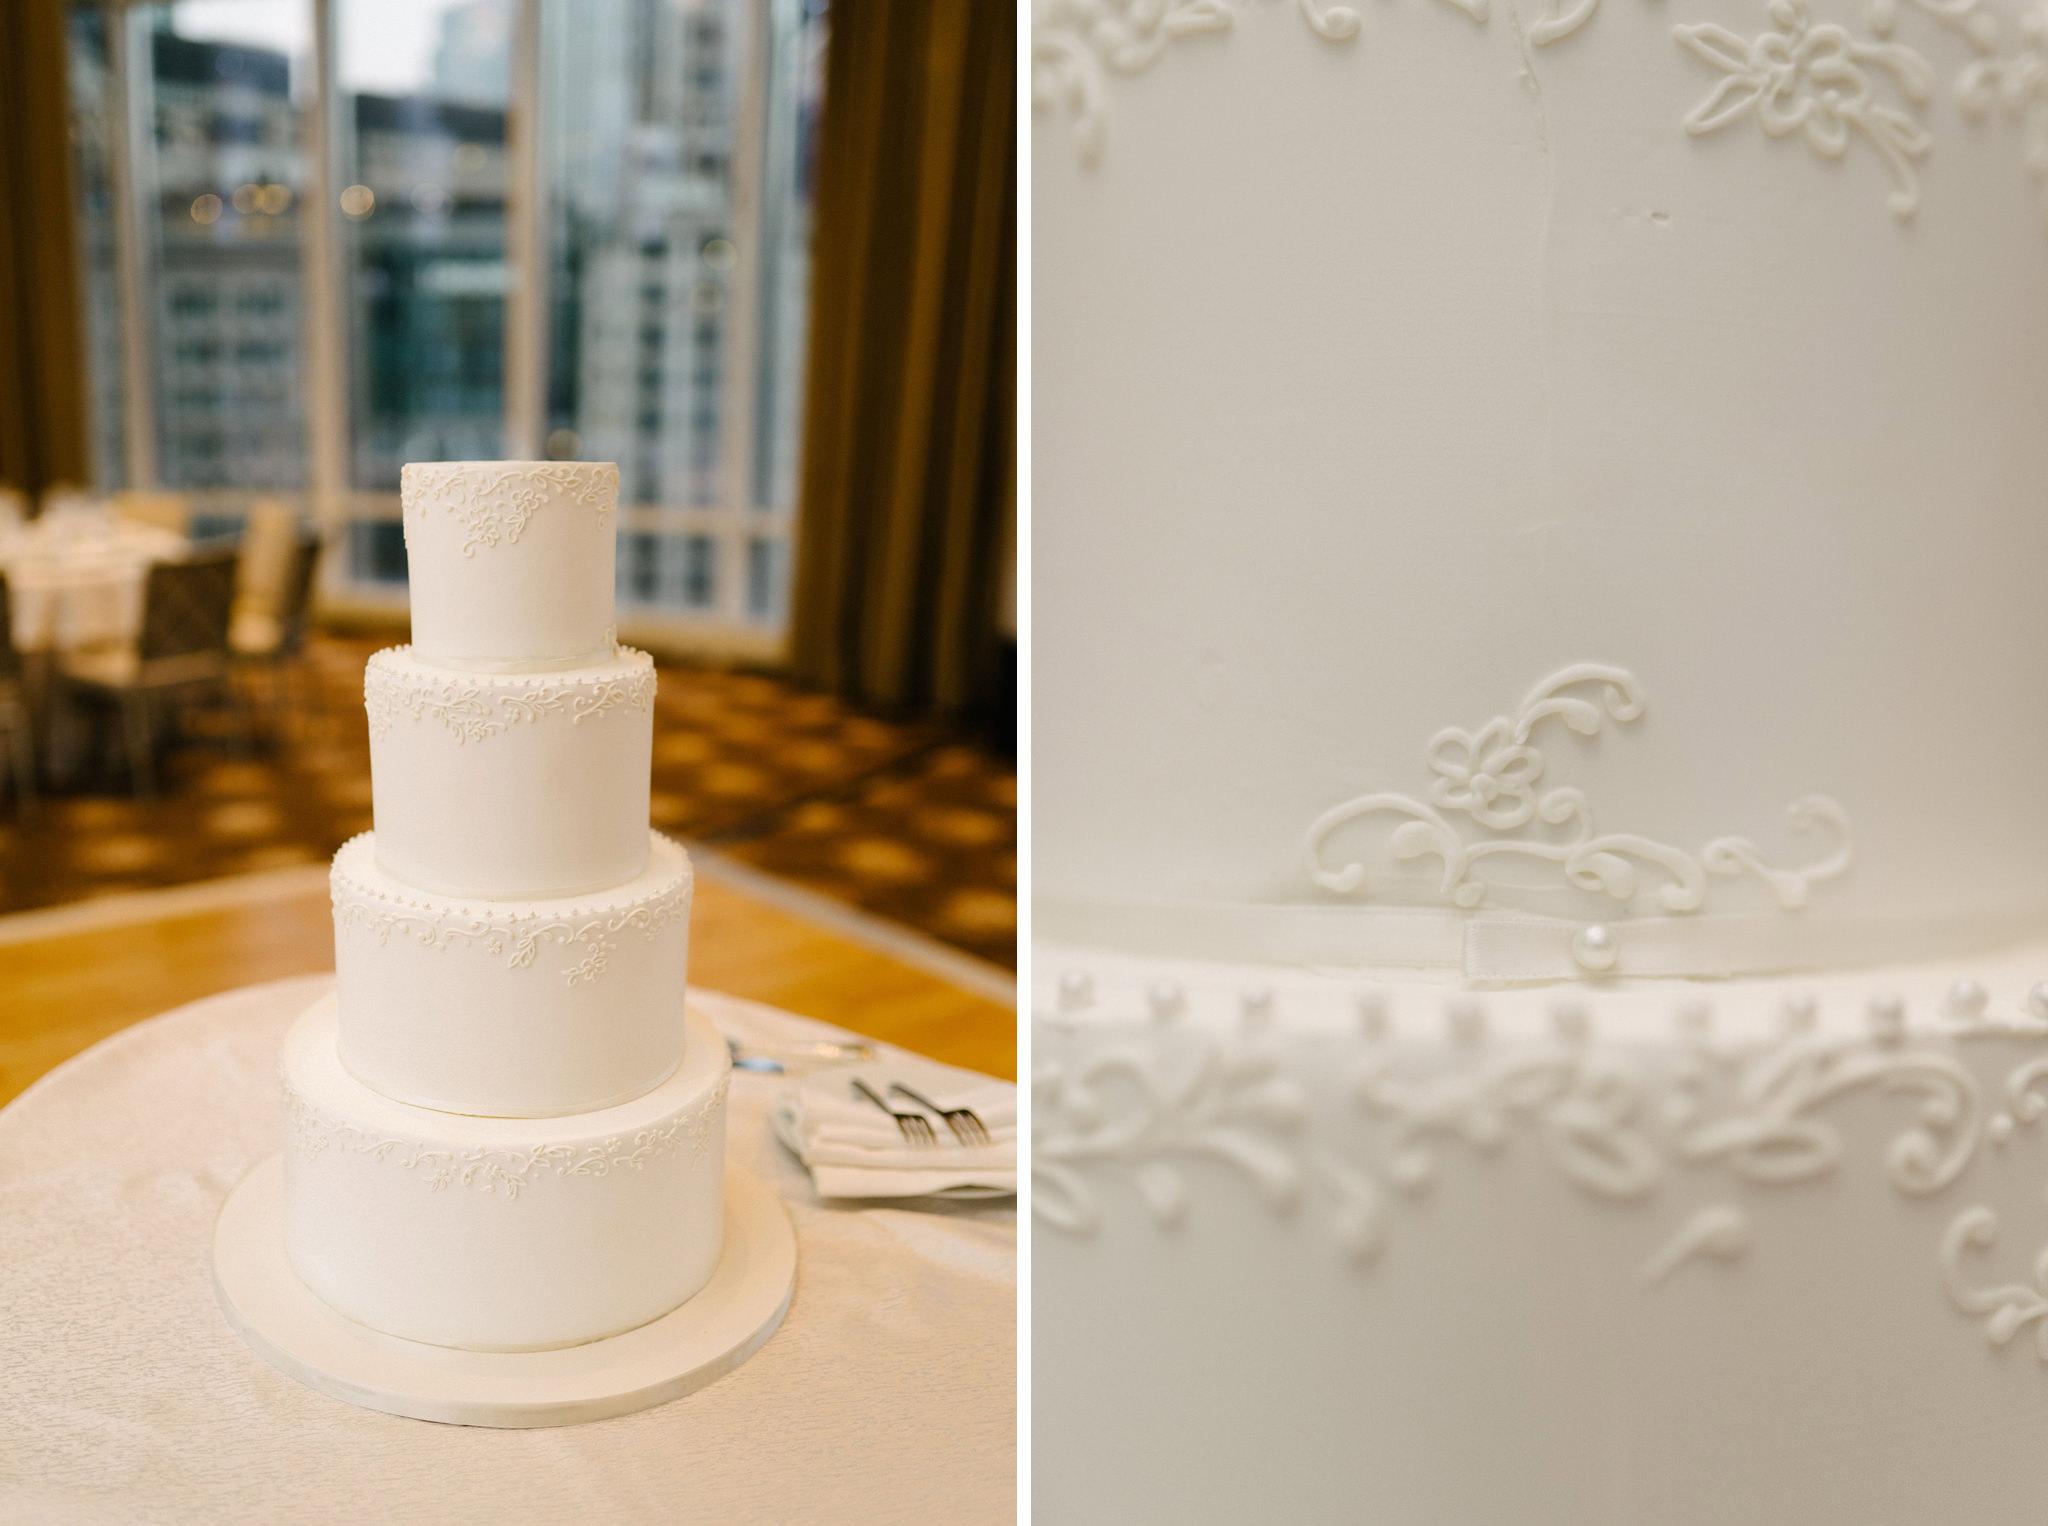 040-rempel-photography-chicago-wedding-inspiration-sara-philip-rockefeller-chapel-trump-tower.jpg